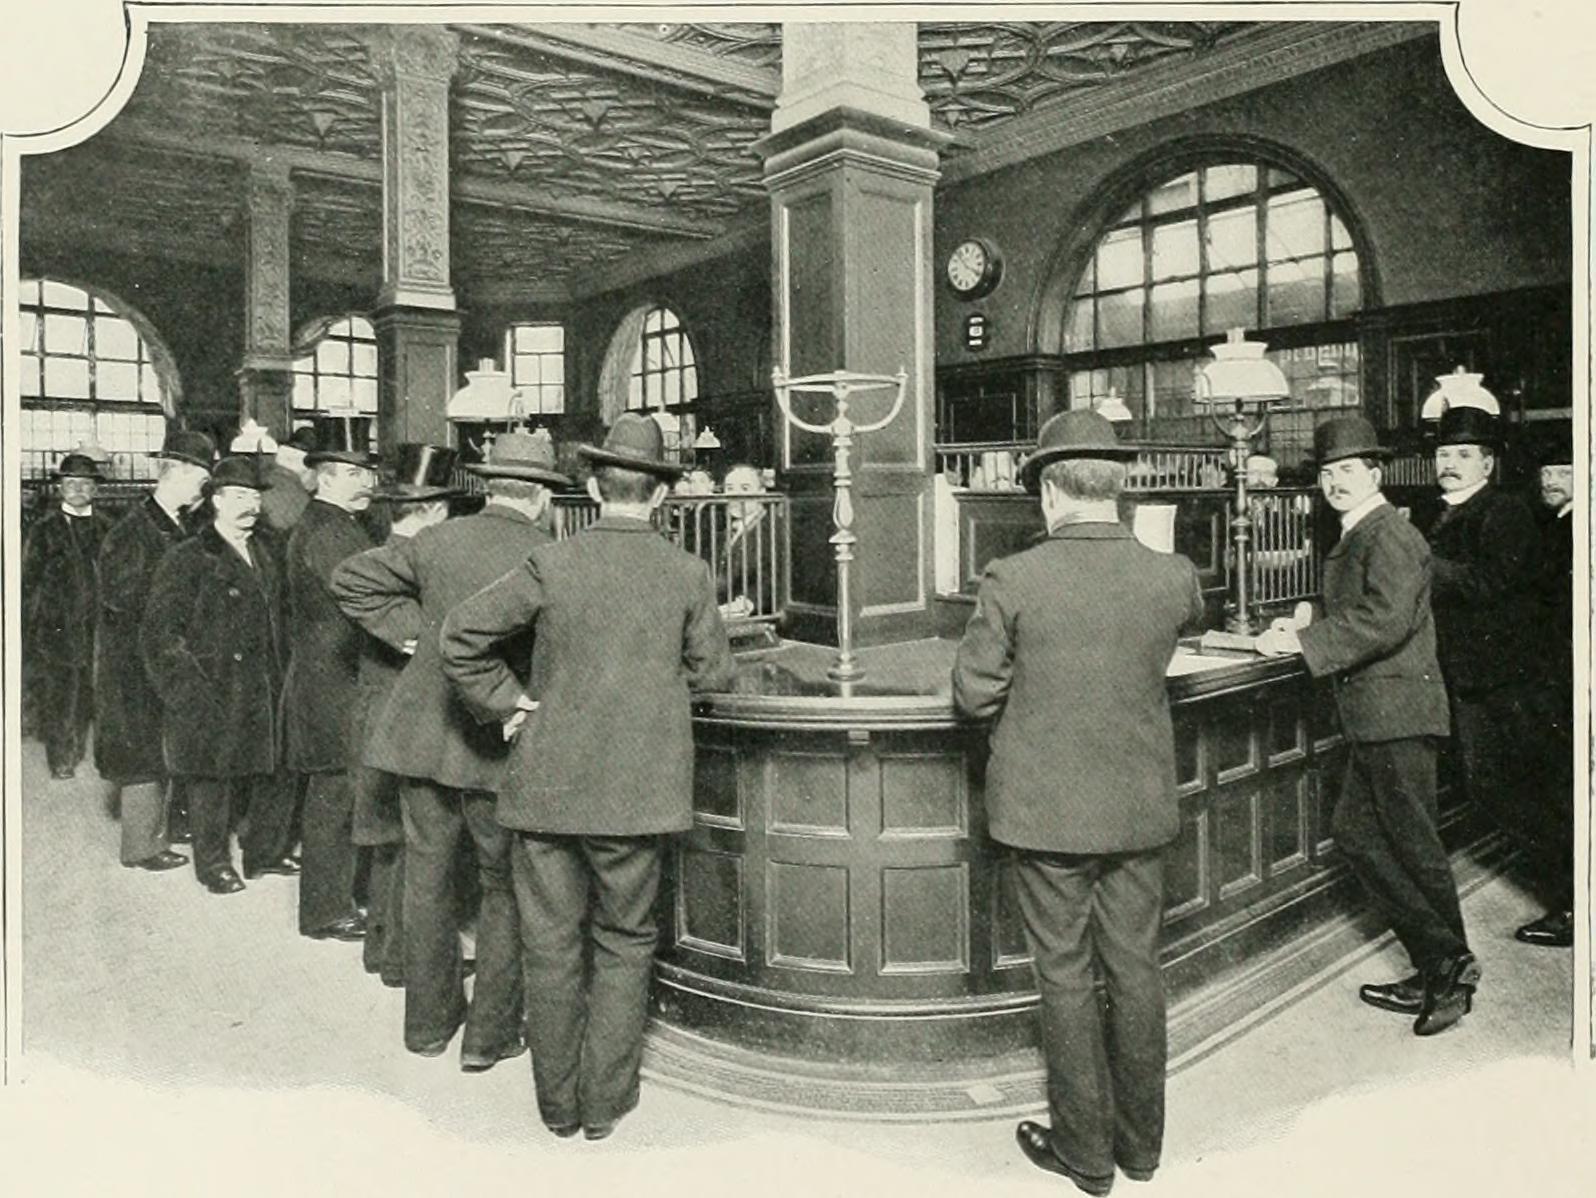 Les gens de Londres: combats, nourriture et filles d'usine - 1902